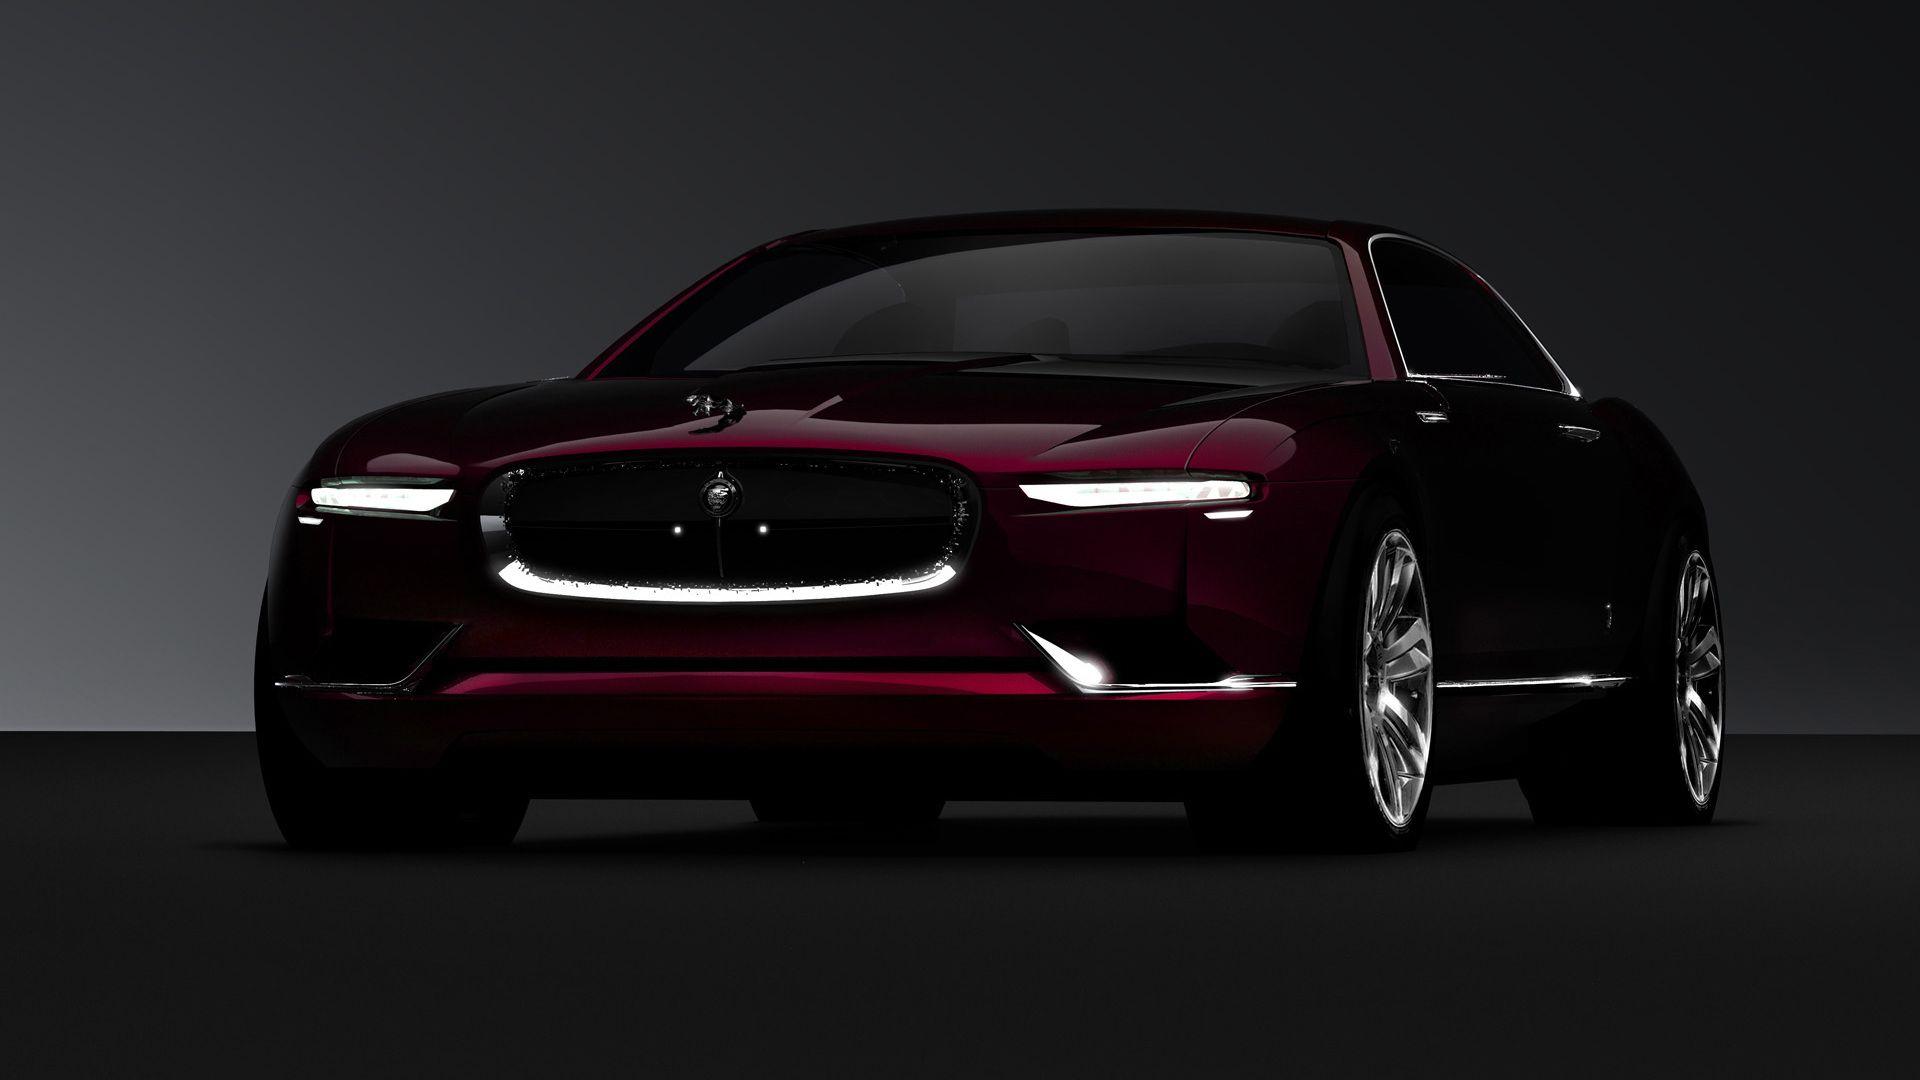 Pin By Understandingzindagi On Automoblie Jaguar Car Jaguar Sport Jaguar